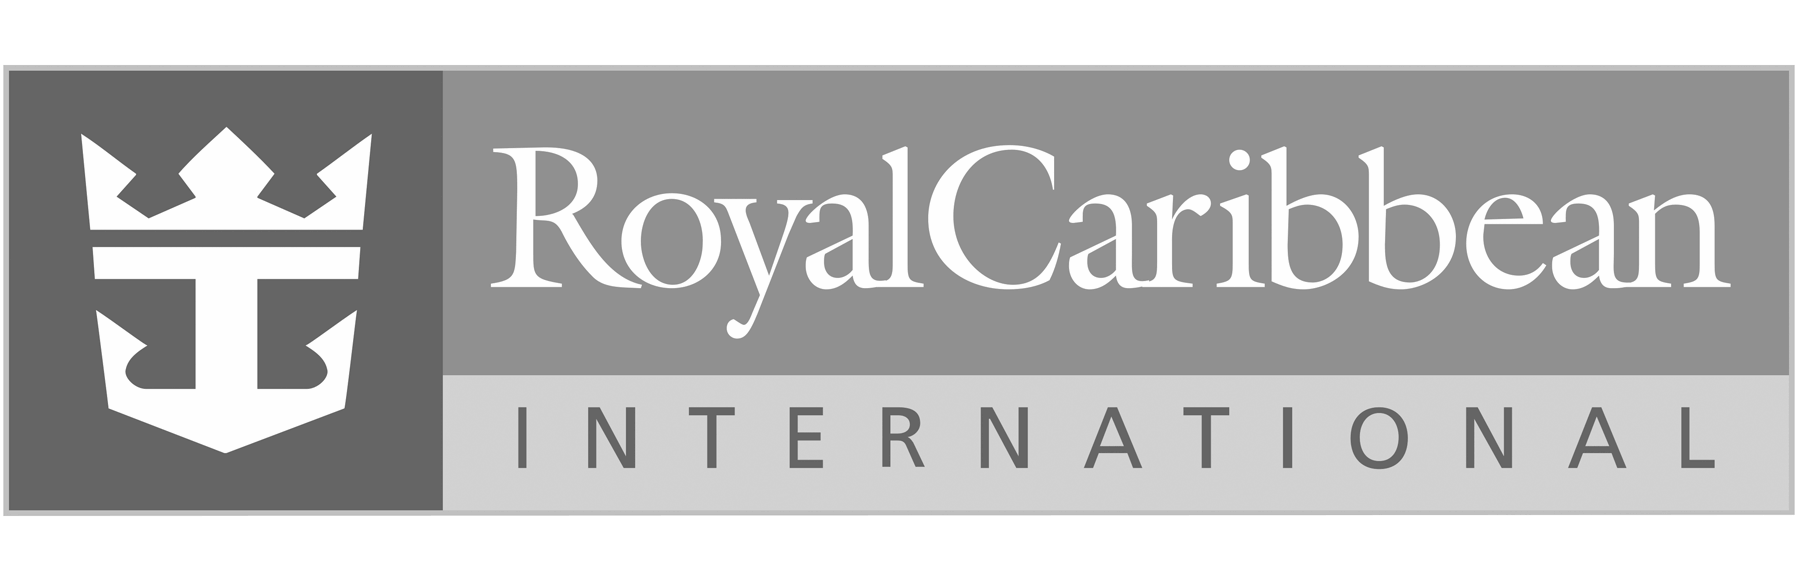 Royalcaribbean Logo